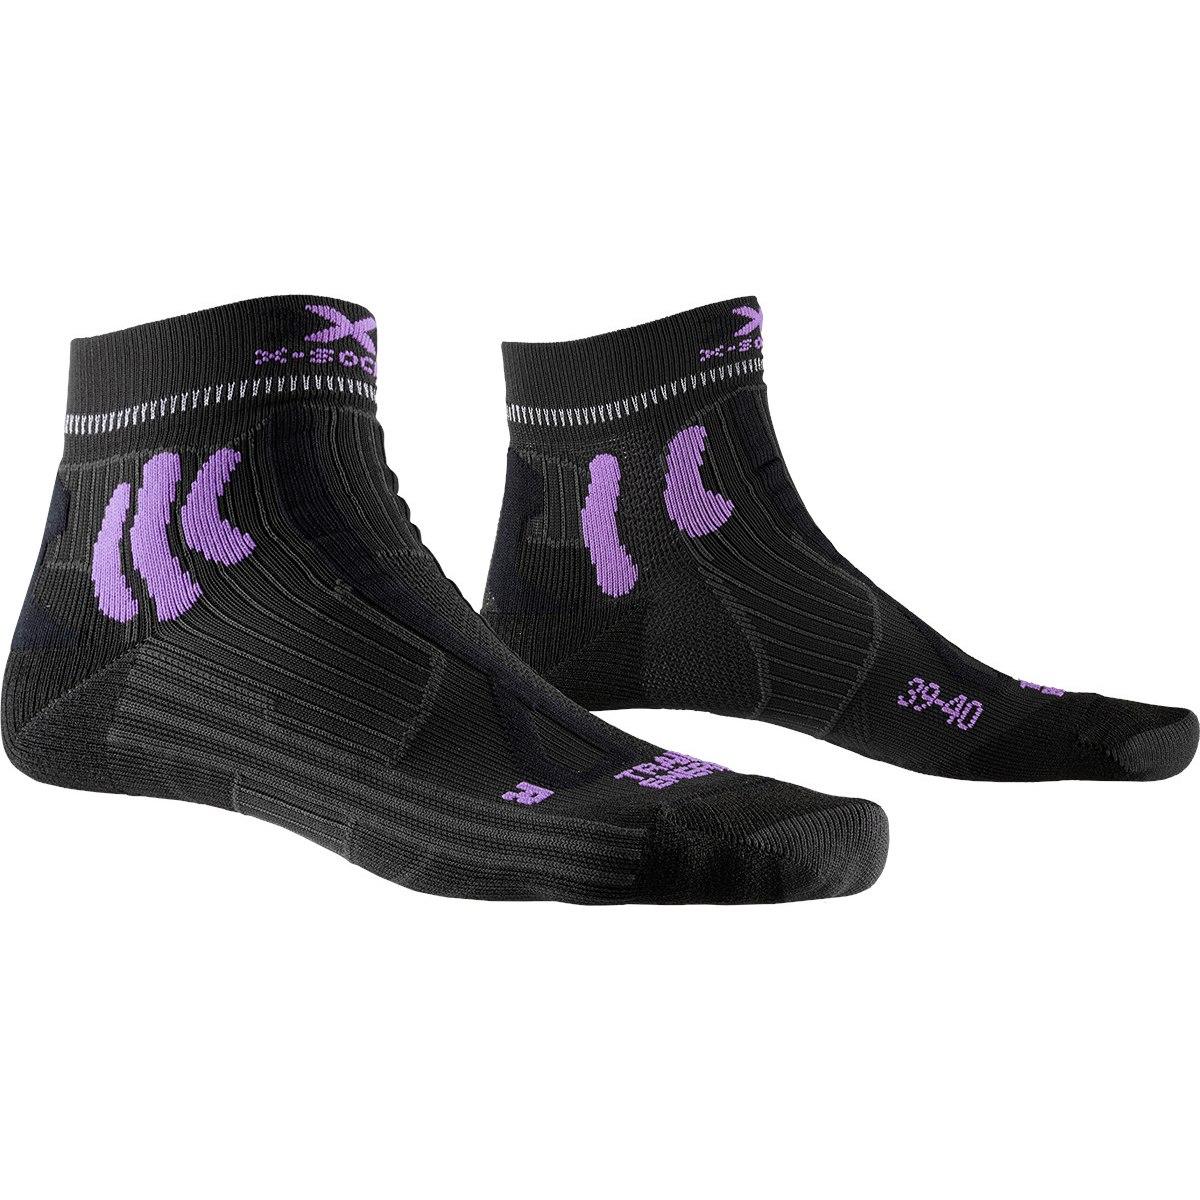 X-Socks Trail Run Energy Damen-Laufsocken - charcoal/bright lavender/pink